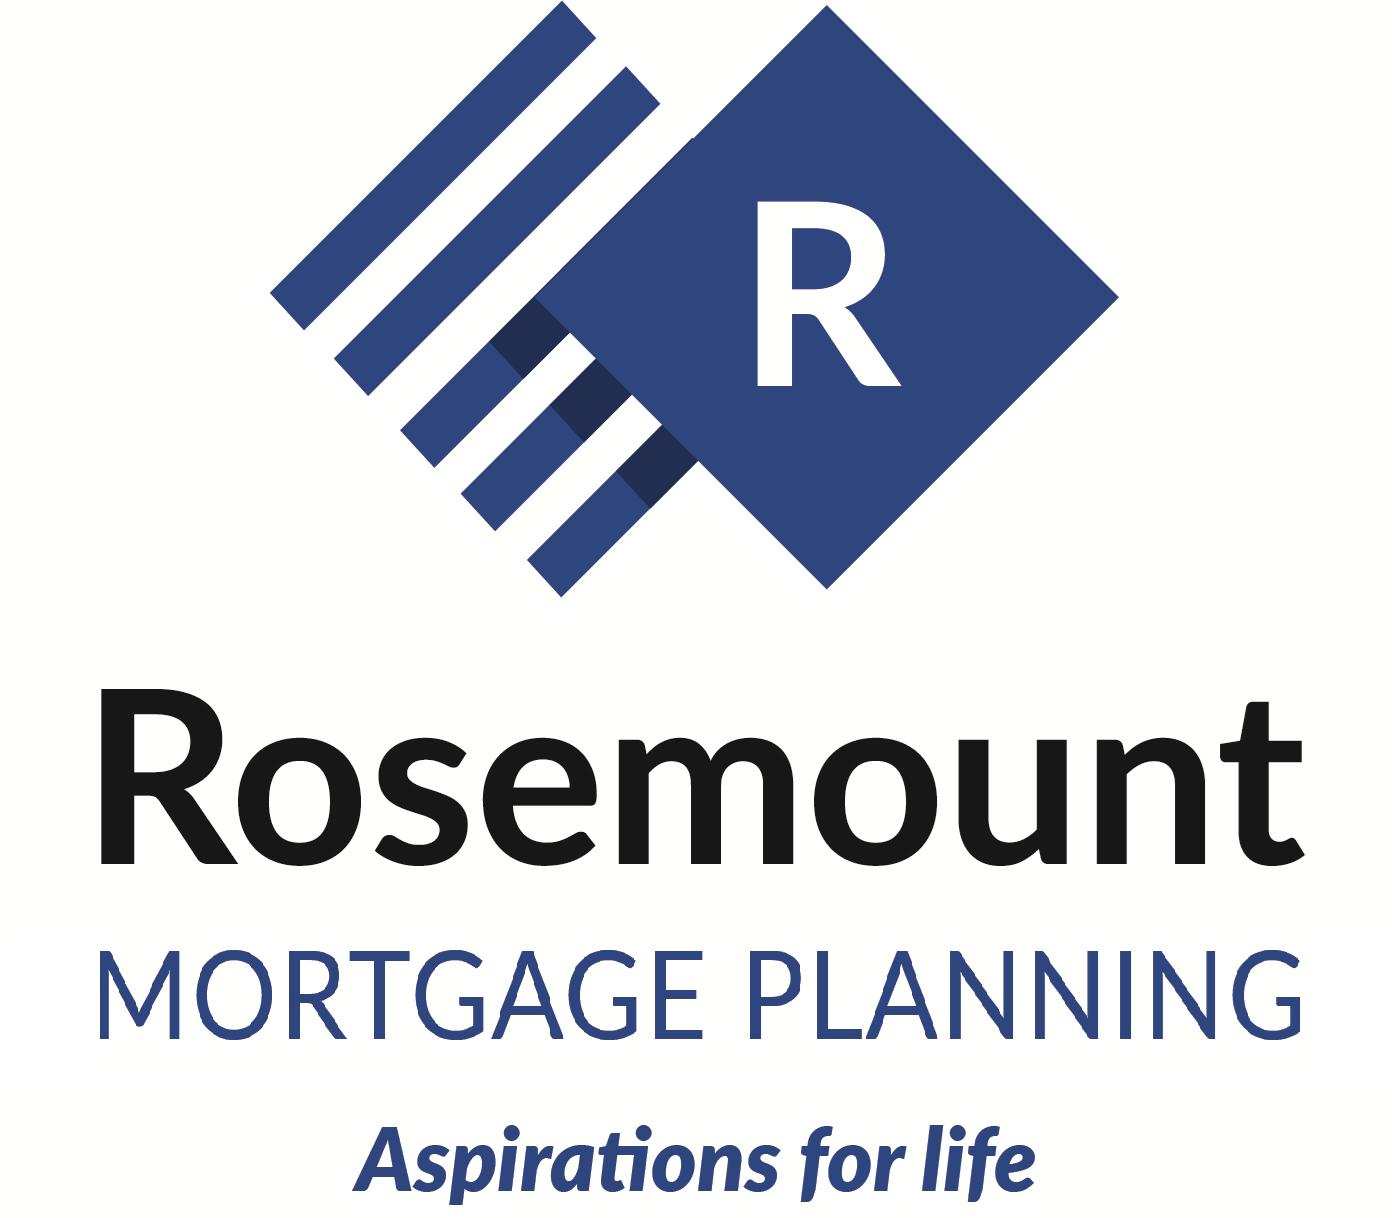 Rosemount Mortgage Planning